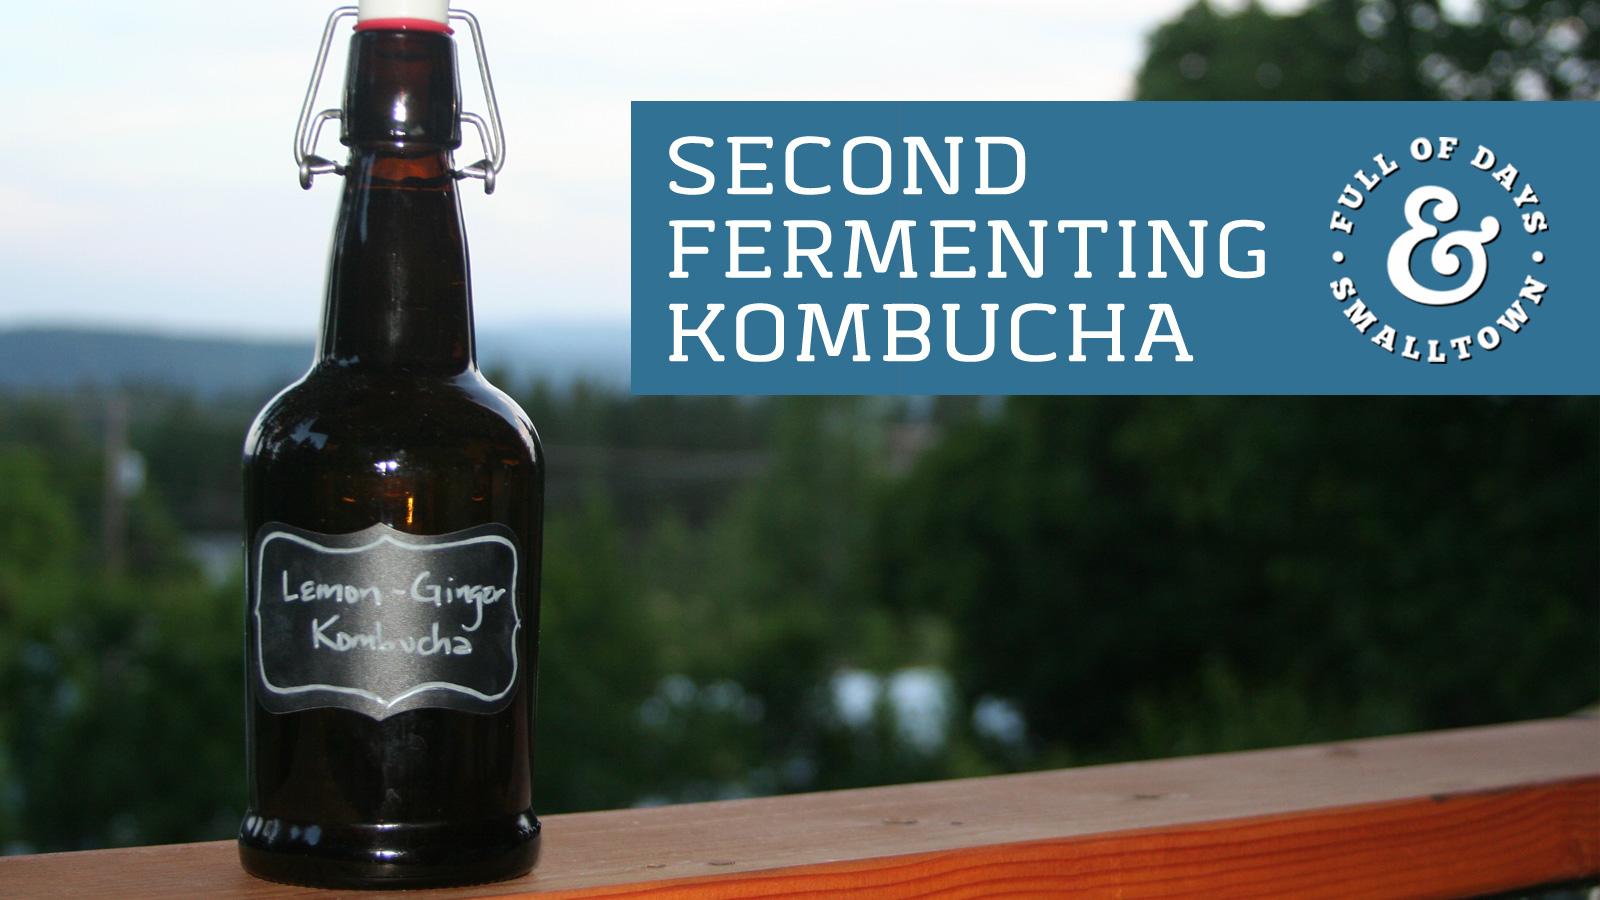 Kombucha Full of Days Second Fermenting